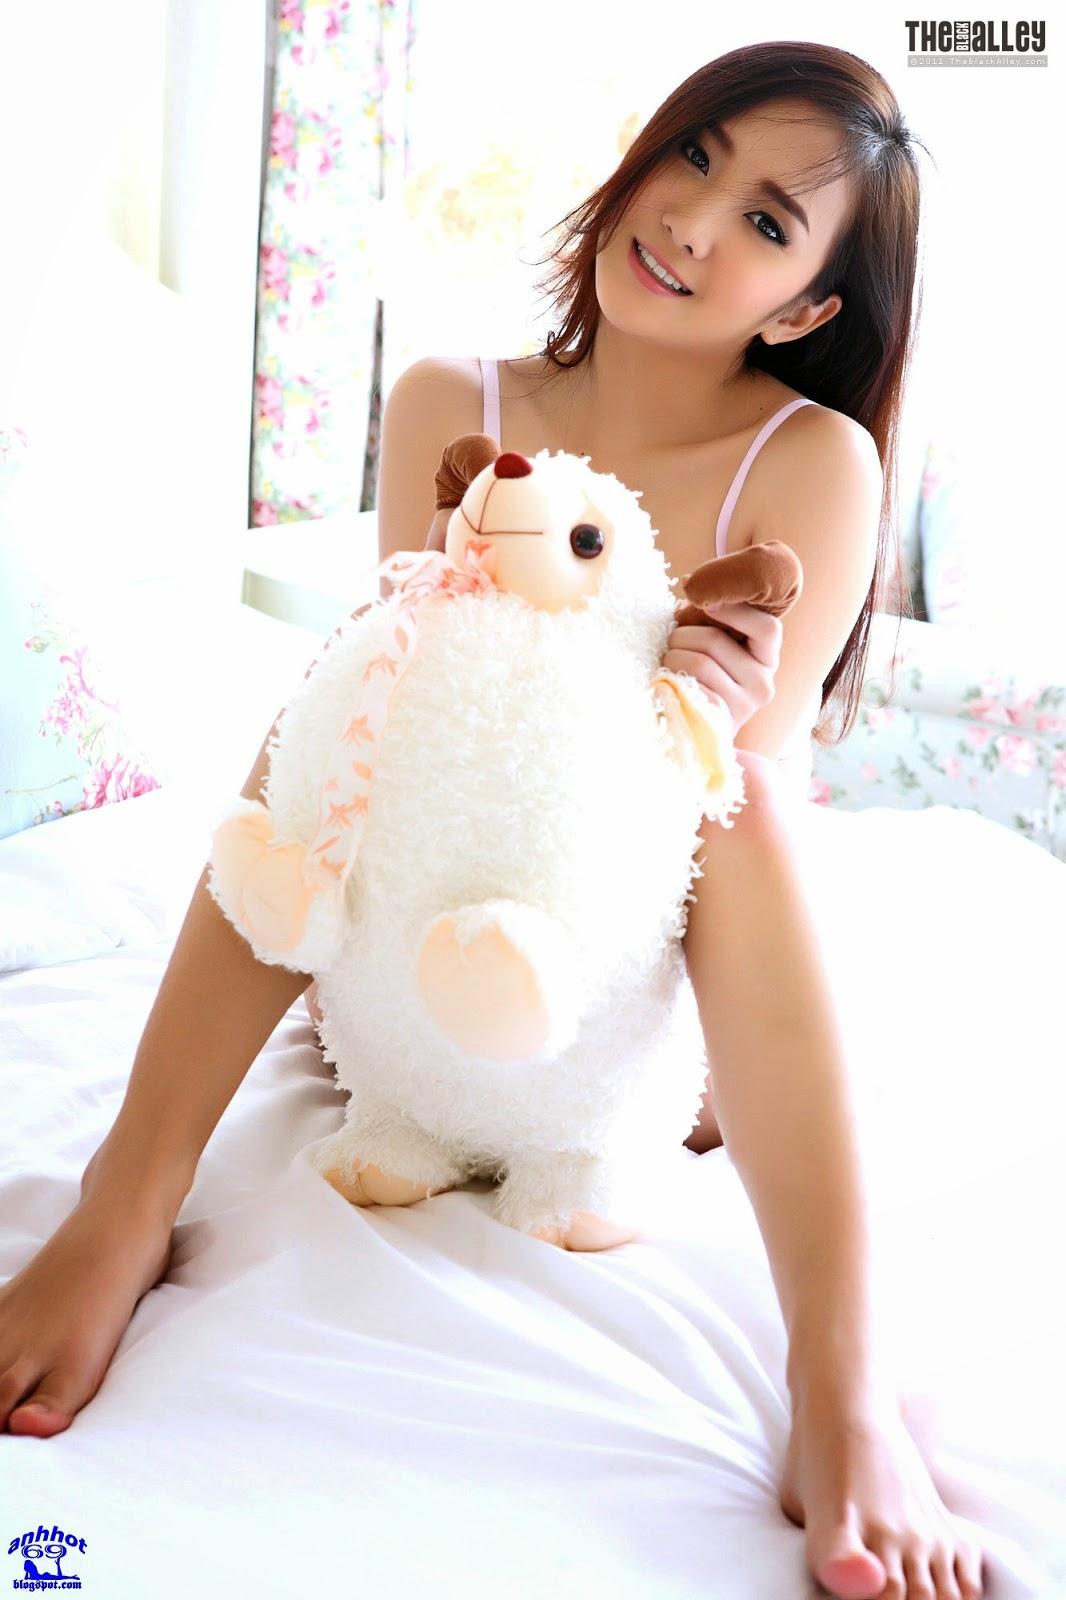 lolita-cheng-64-027